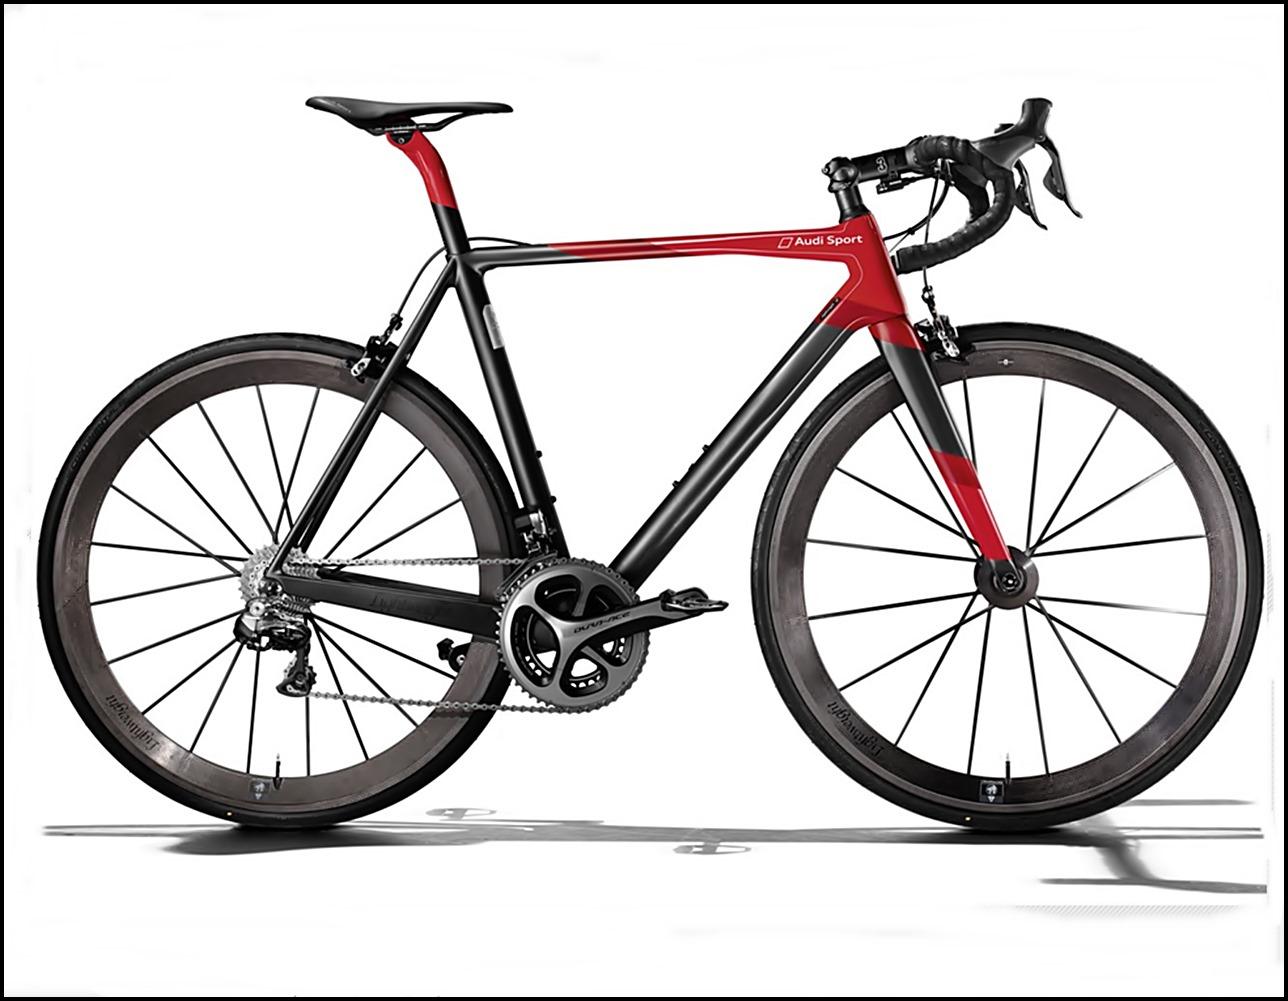 Fahrrad, Audi Fahrrad, Audi Sport, Audi Sport Racing Bike, Carbon, Audi Bike, Gadget,